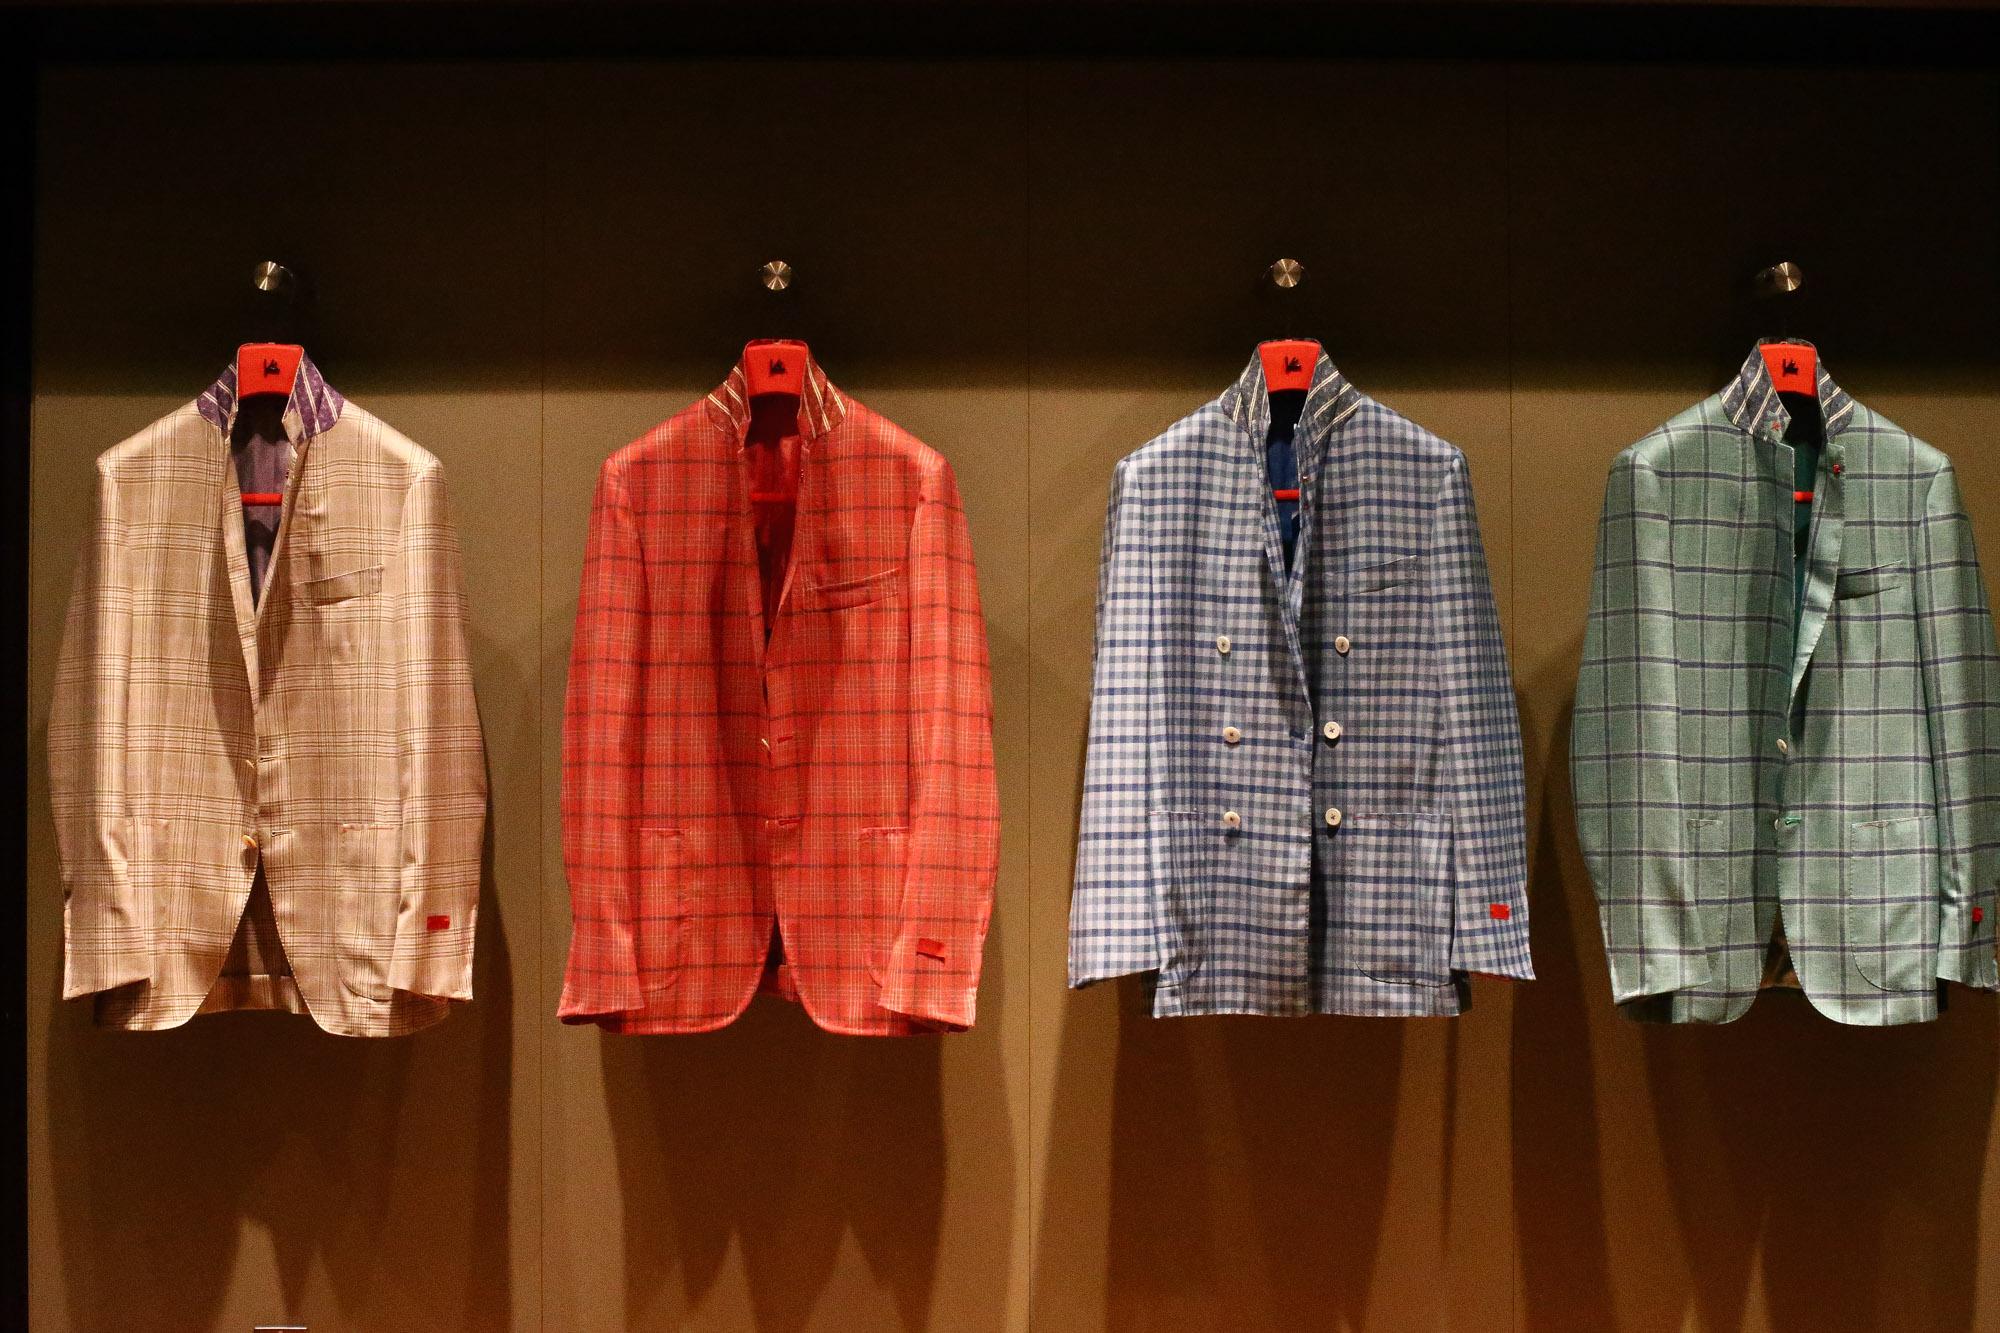 ISAIA イザイア 2017年 春夏 展示会 愛知 名古屋 ZODIAC 取扱い ジャケットスタイル提案